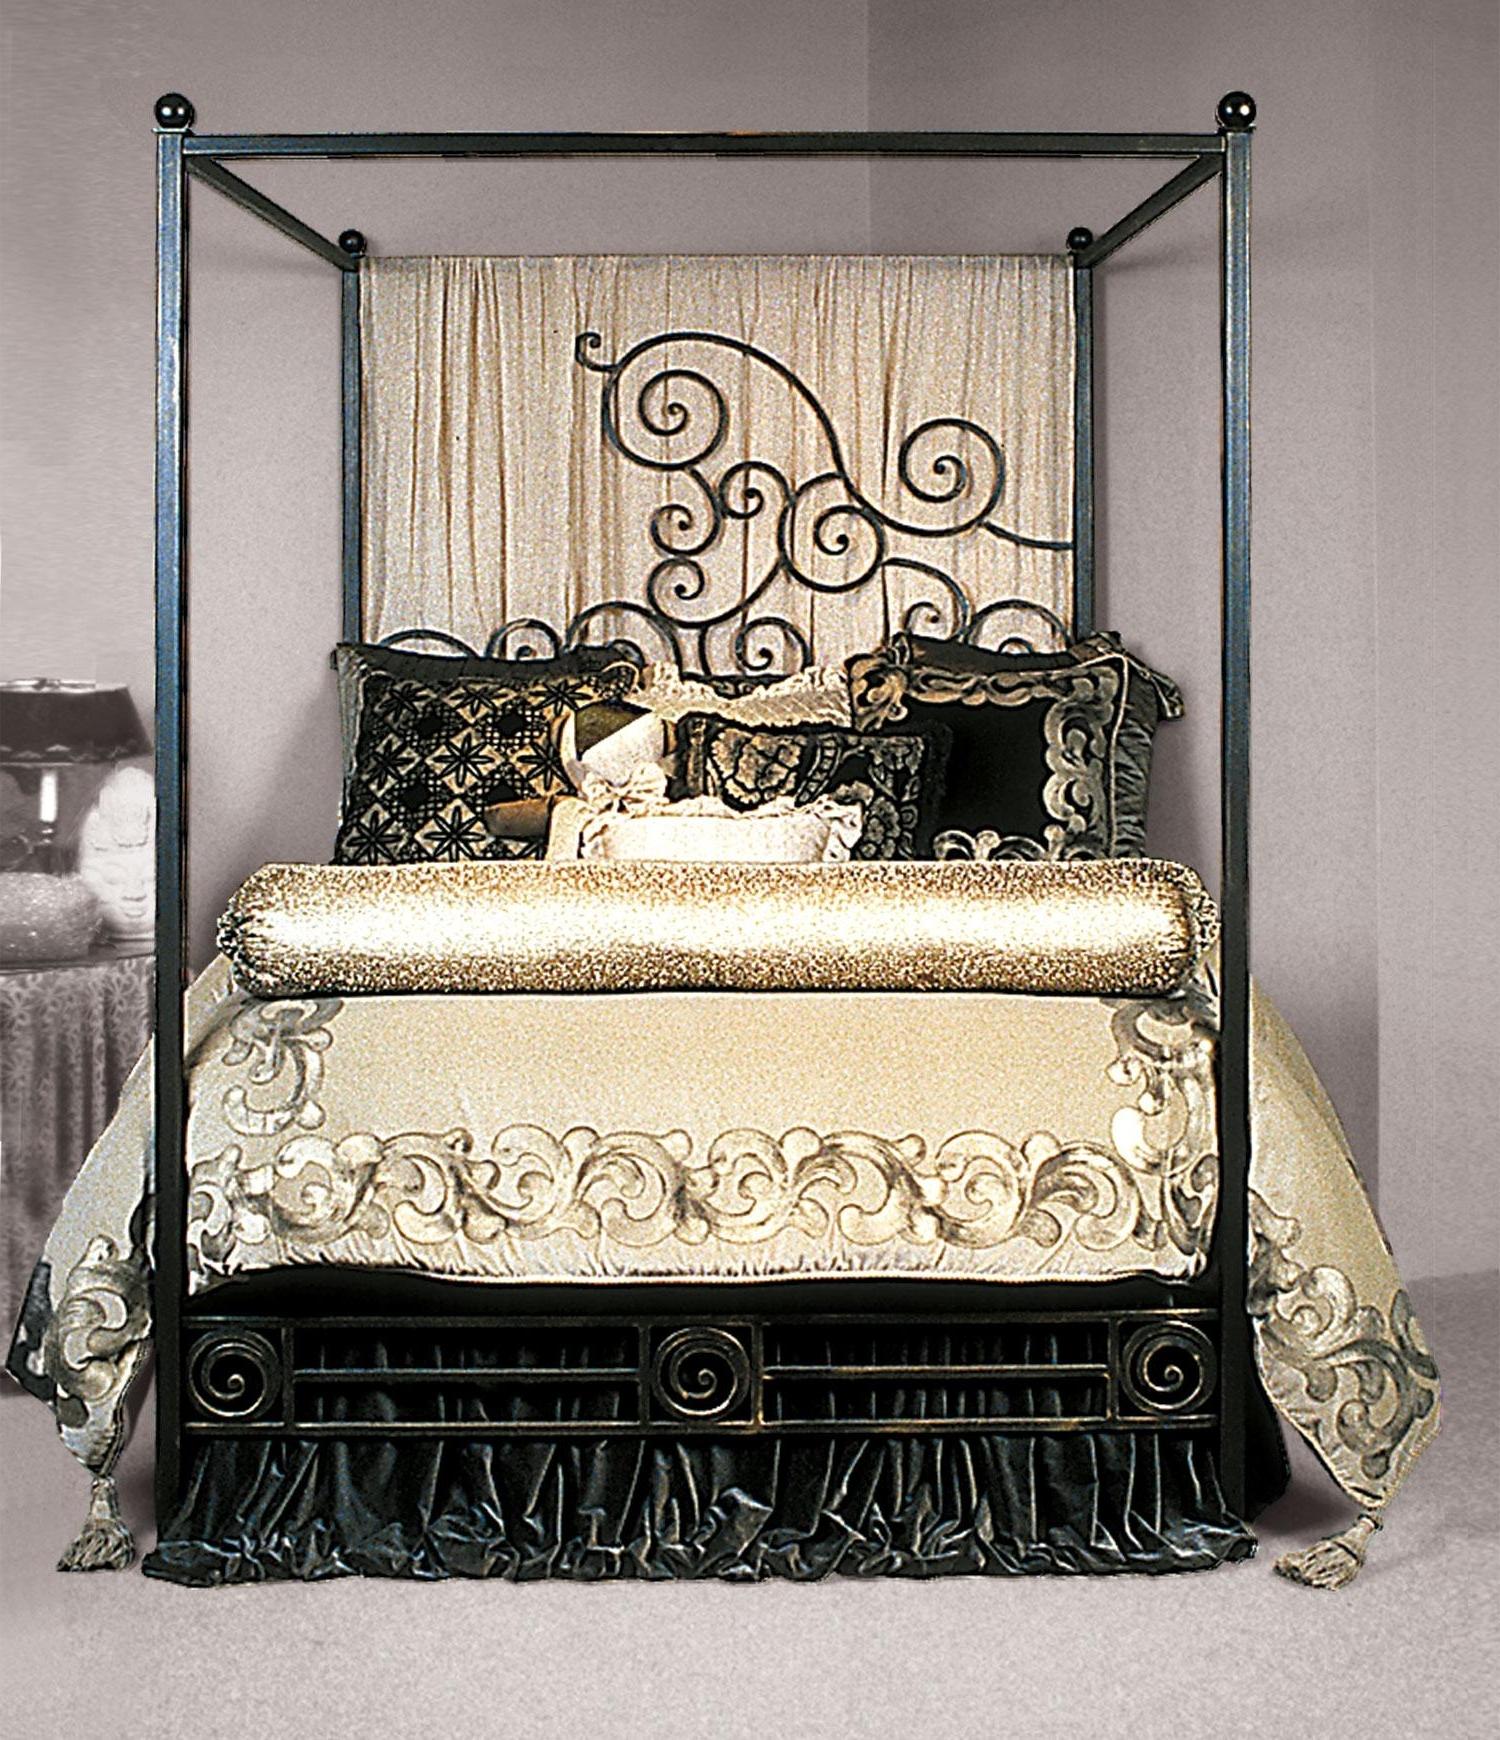 Popular Bedroom : Tuscan Decor For Sale Tuscan Wall Decor Italian For Rustic Italian Wall Art (View 10 of 15)